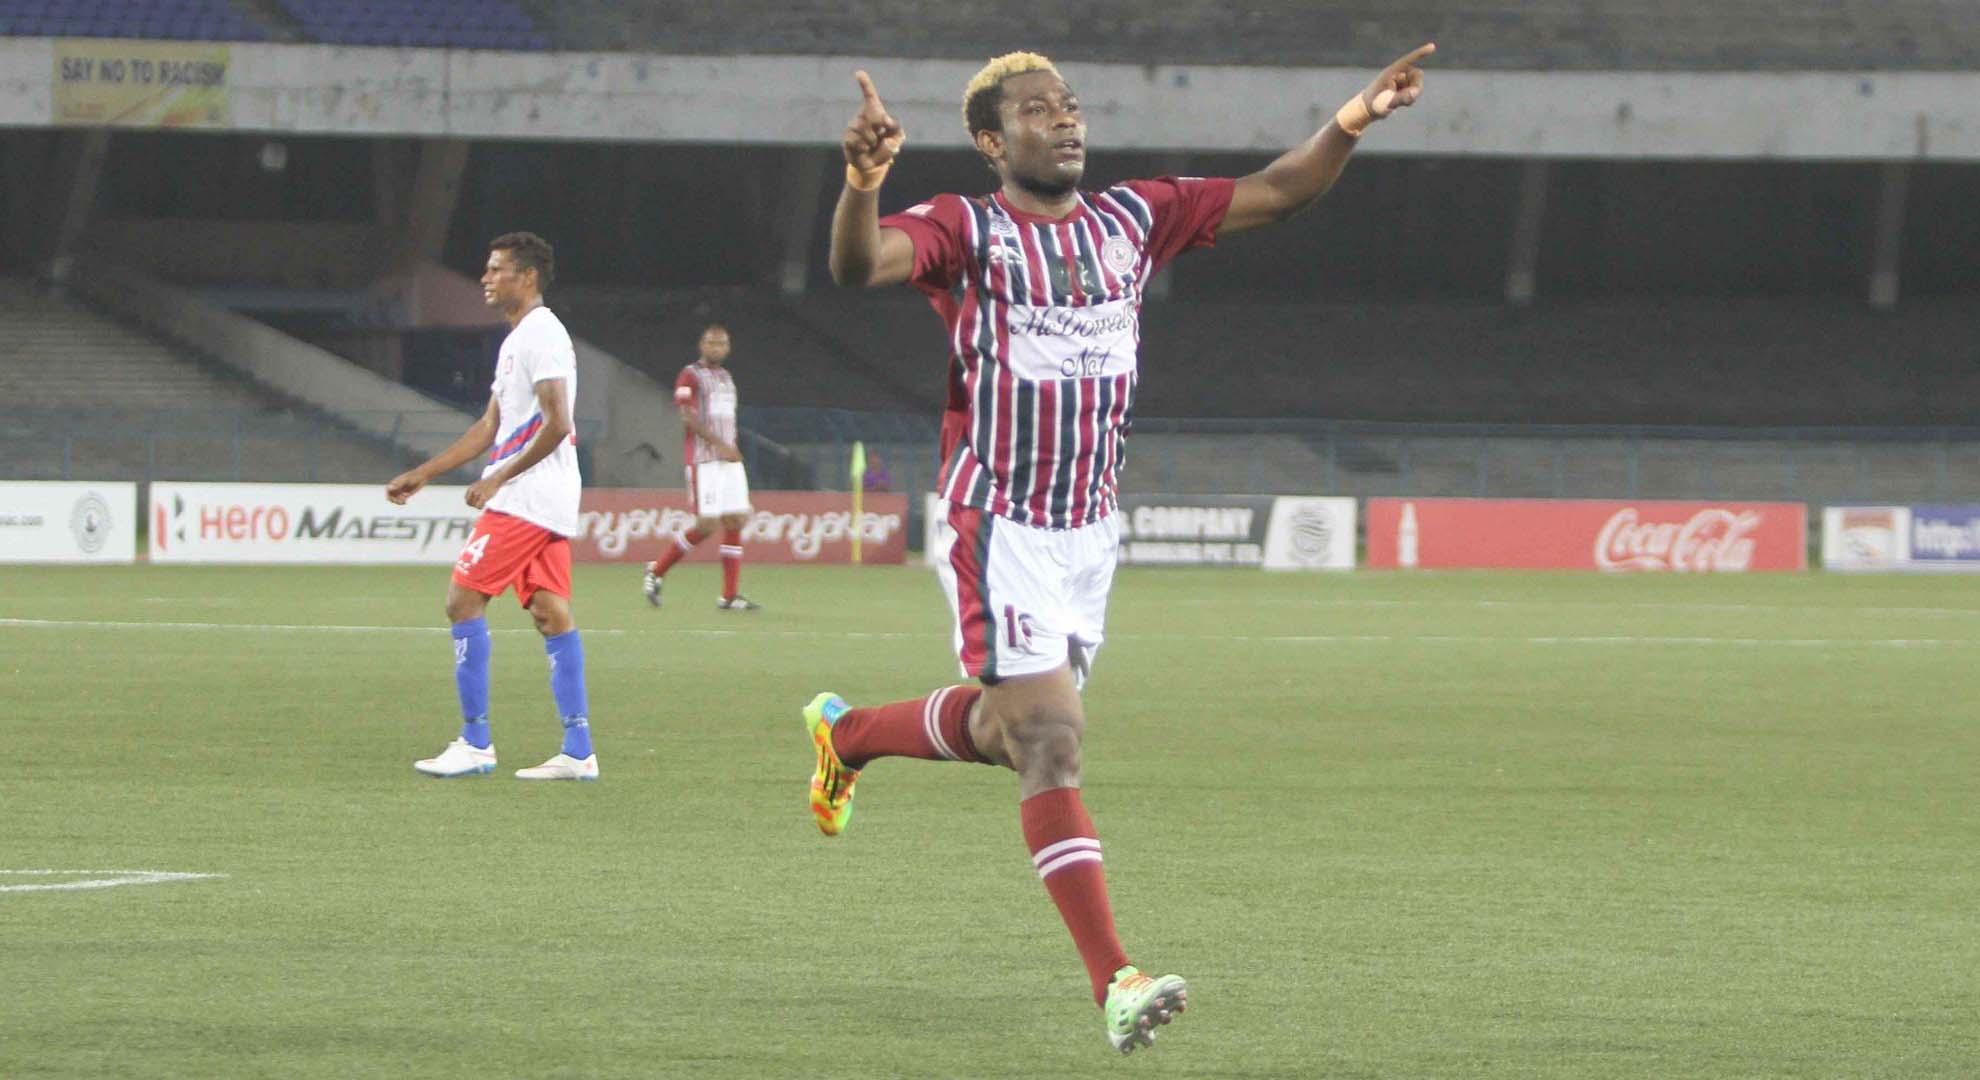 Sony Norde Mohun Bagan Bharat FC I-League 11042015